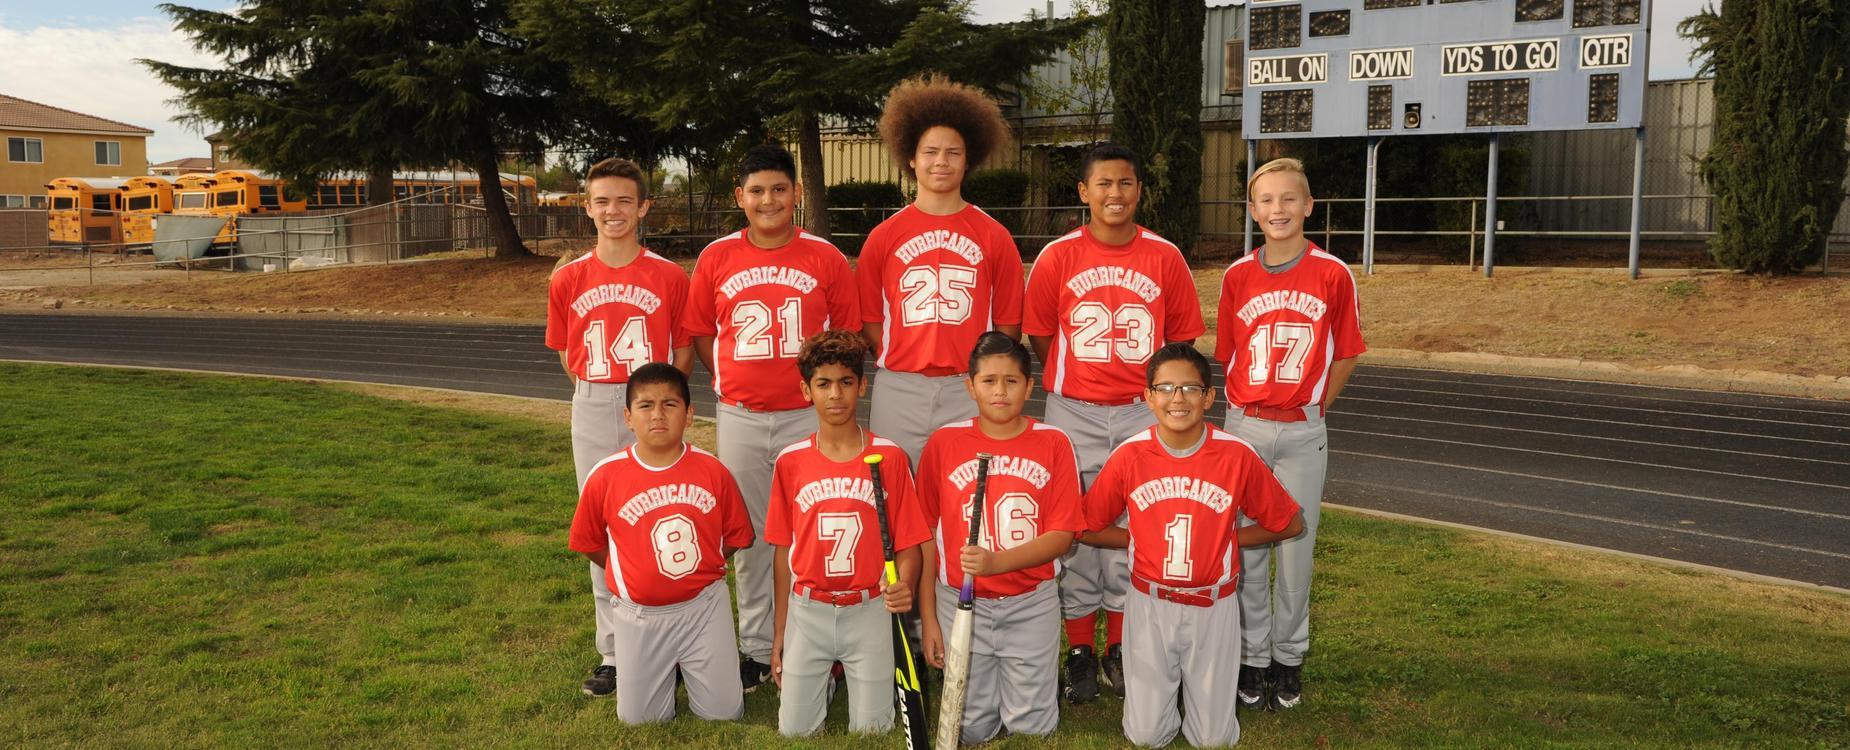 SGMS boys baseball team